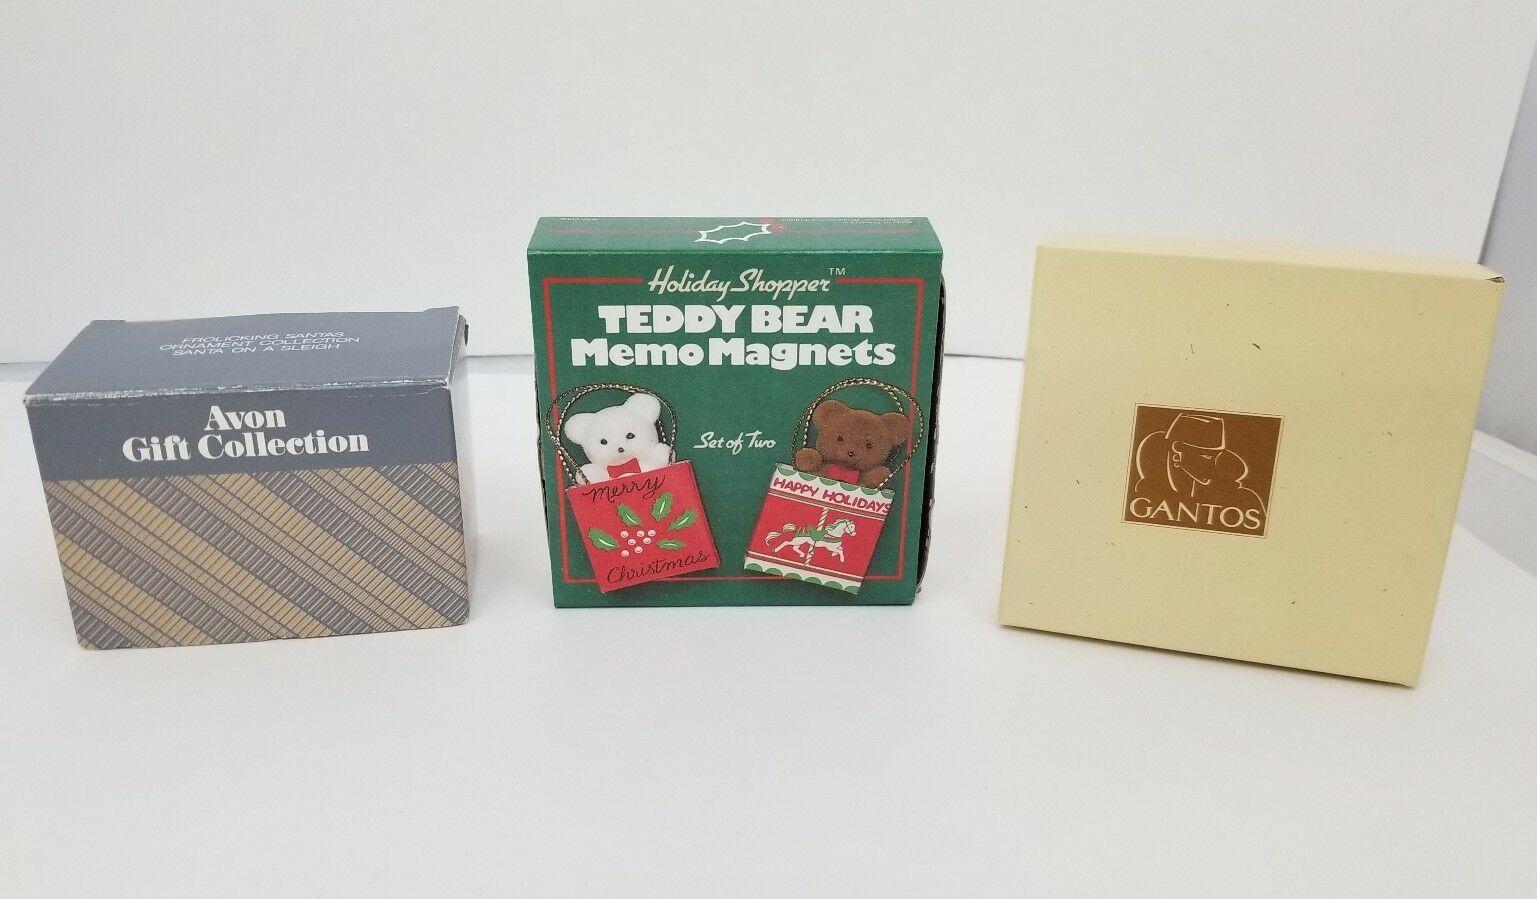 Christmas Tree Ornaments Set of 4 Avon Santa Claus Sleigh Teddy Bear Memo Magnet